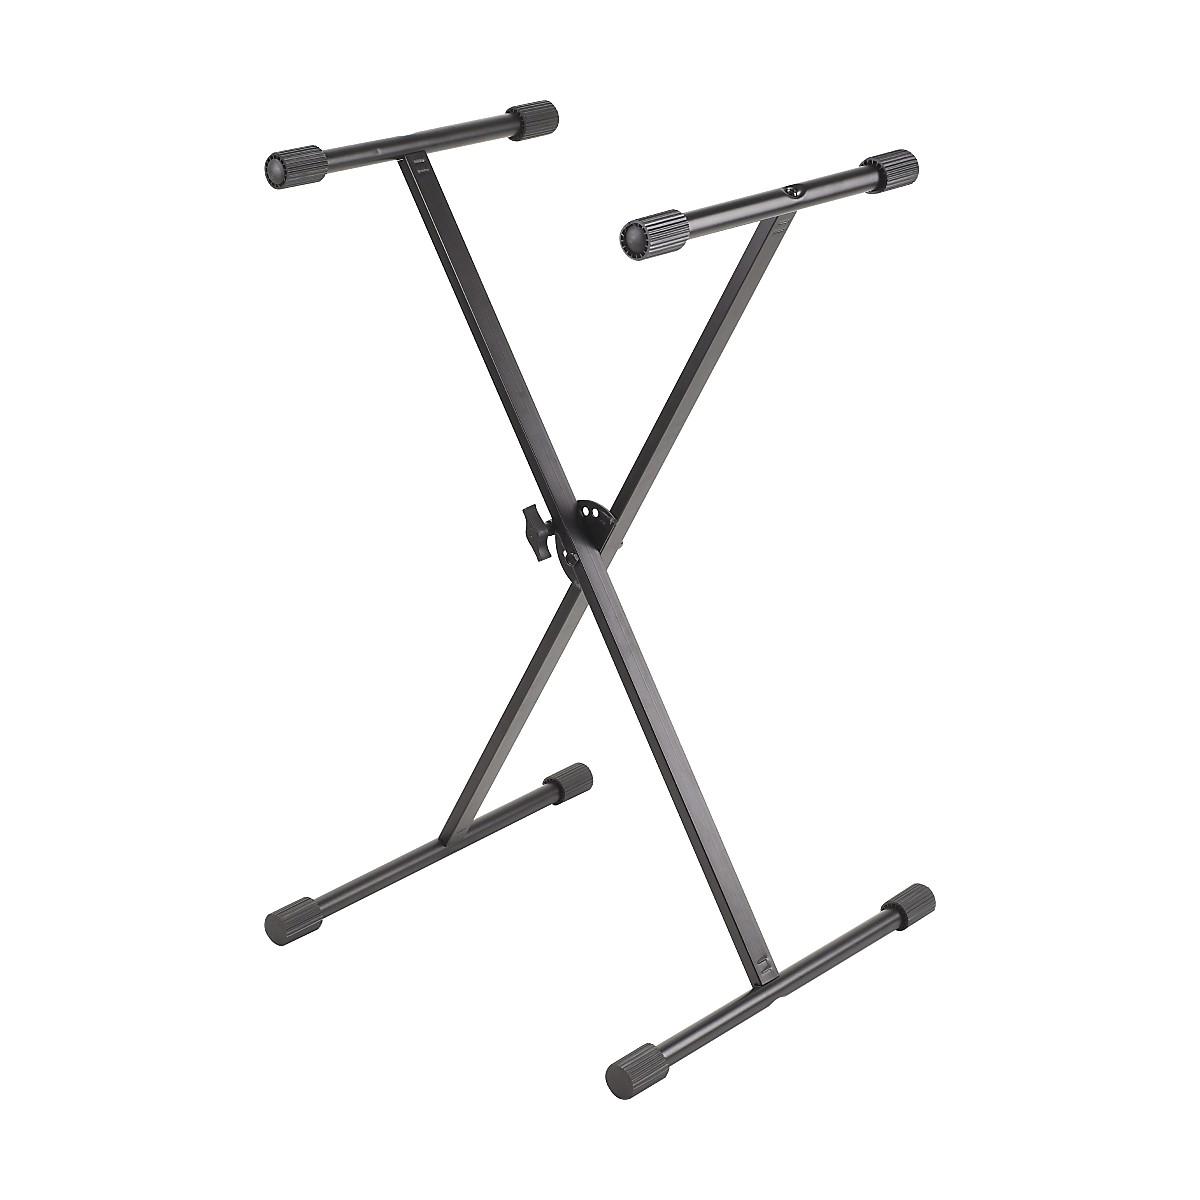 Proline PL100 X-Braced Keyboard Stand